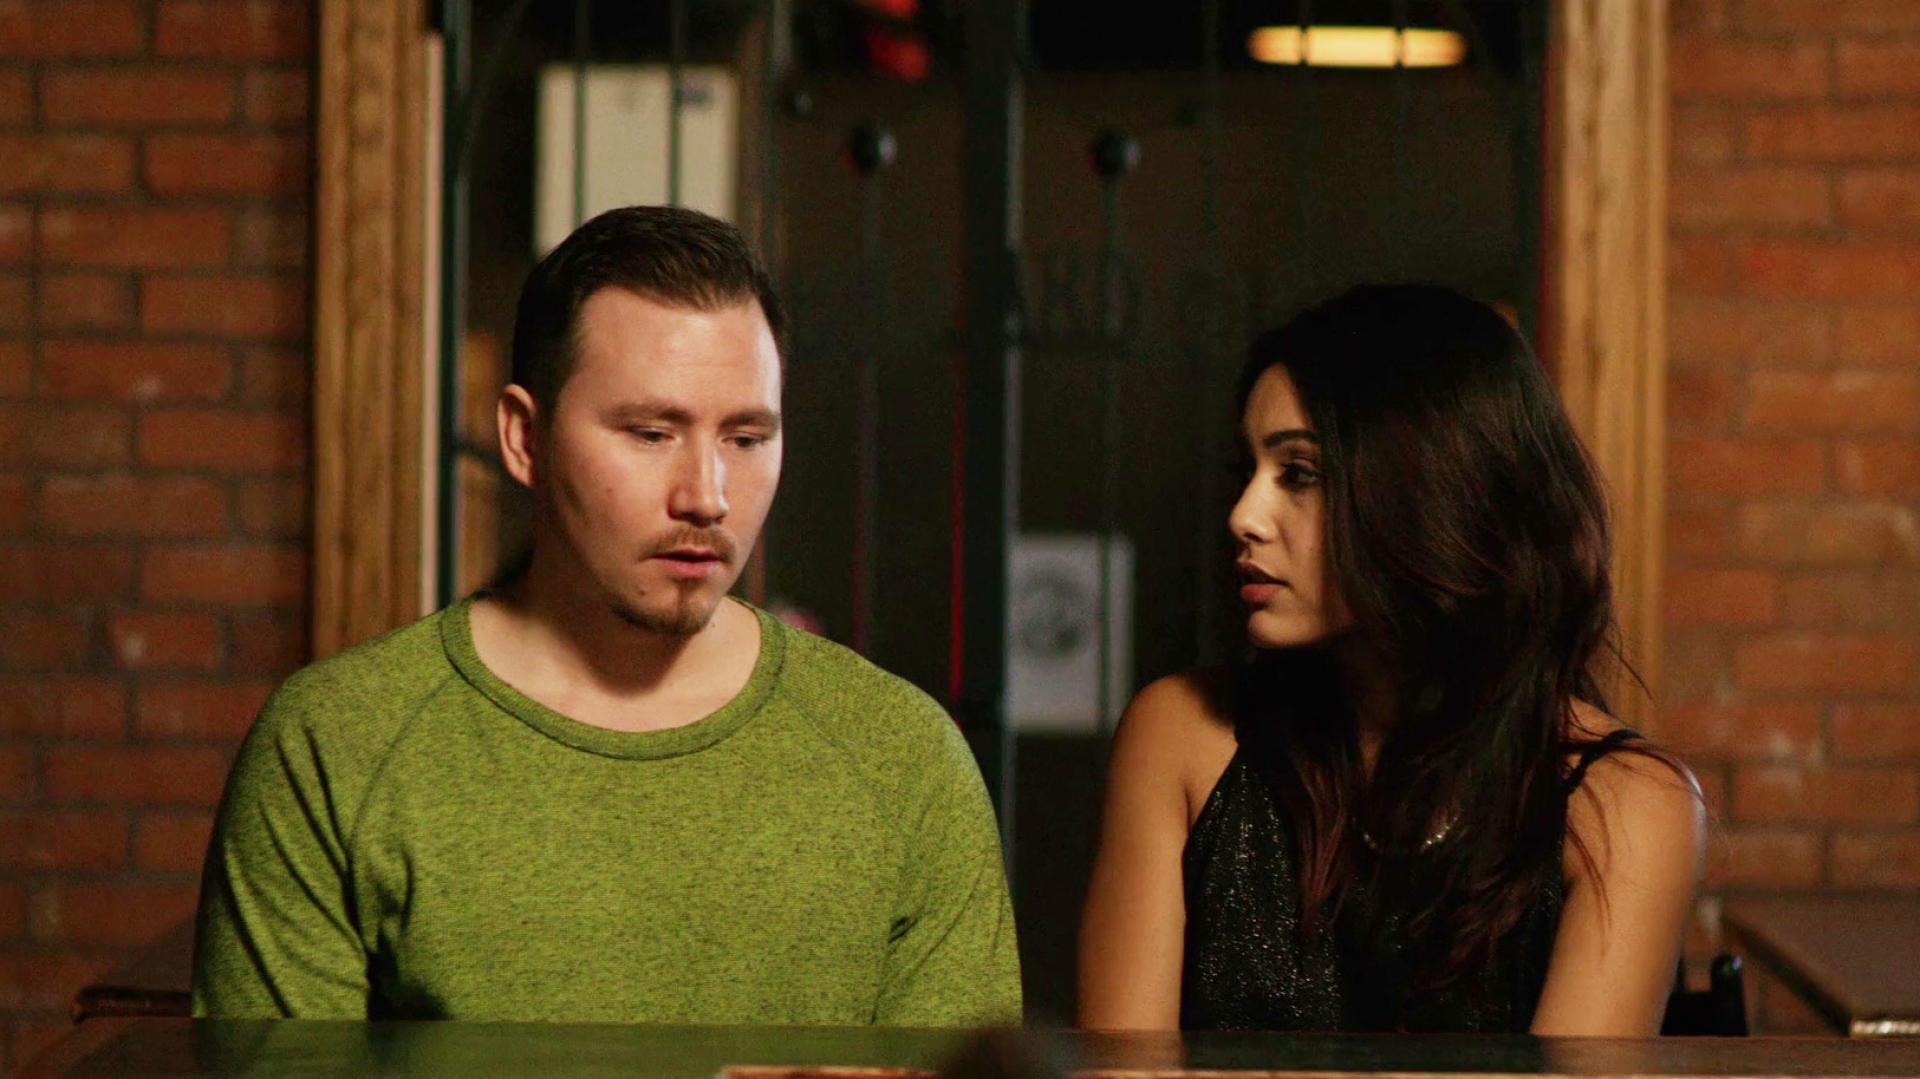 Love Departure By Dc Brandon Canada Drama Short Film Viddsee